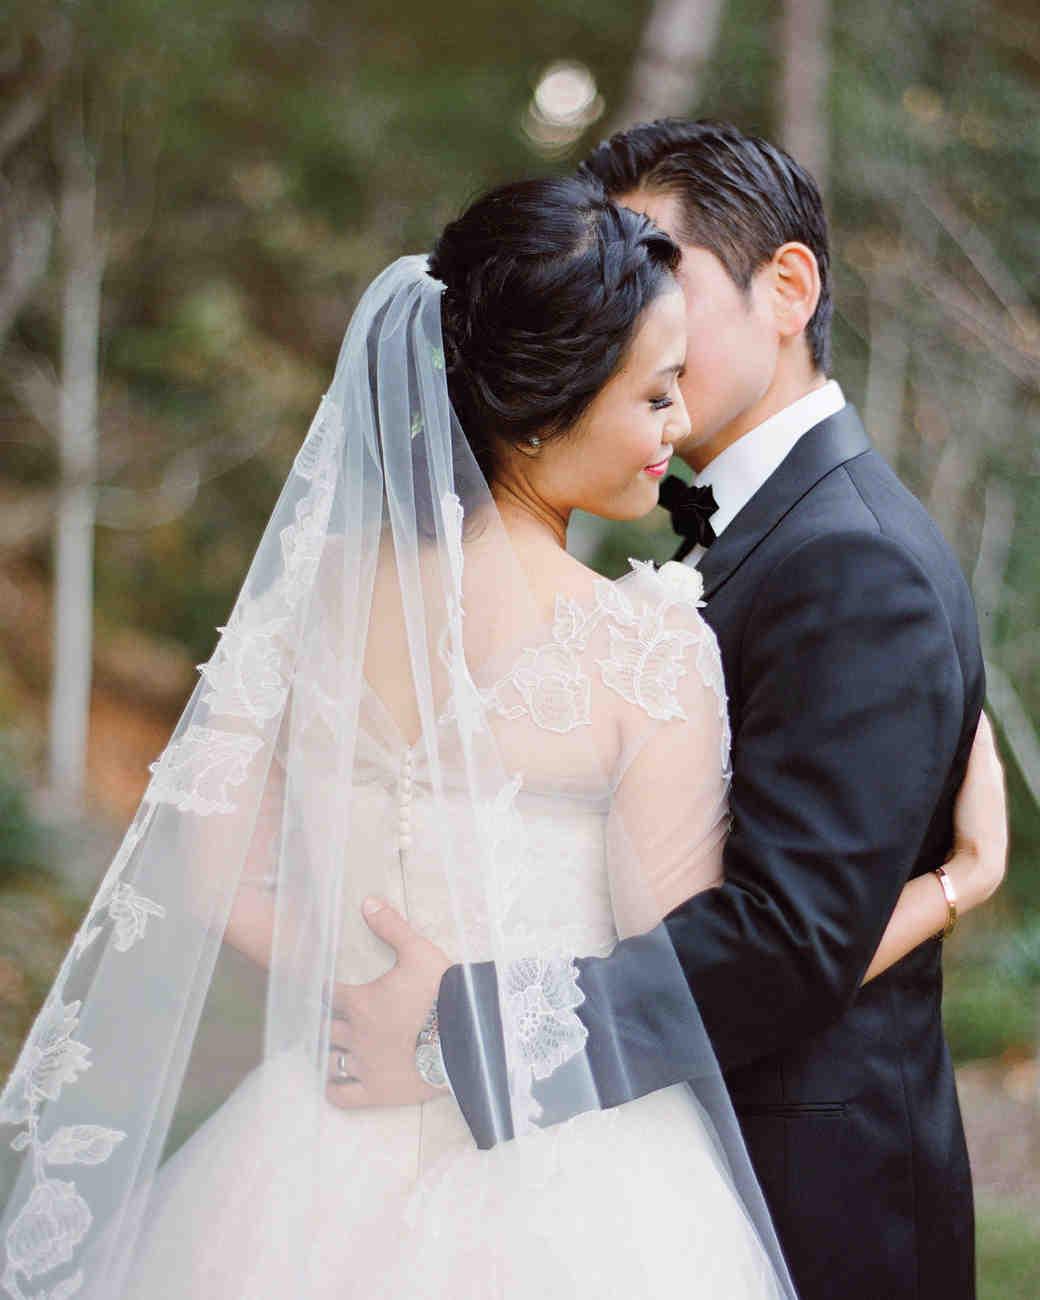 adriana-han-wedding-57870013-s111814.jpg